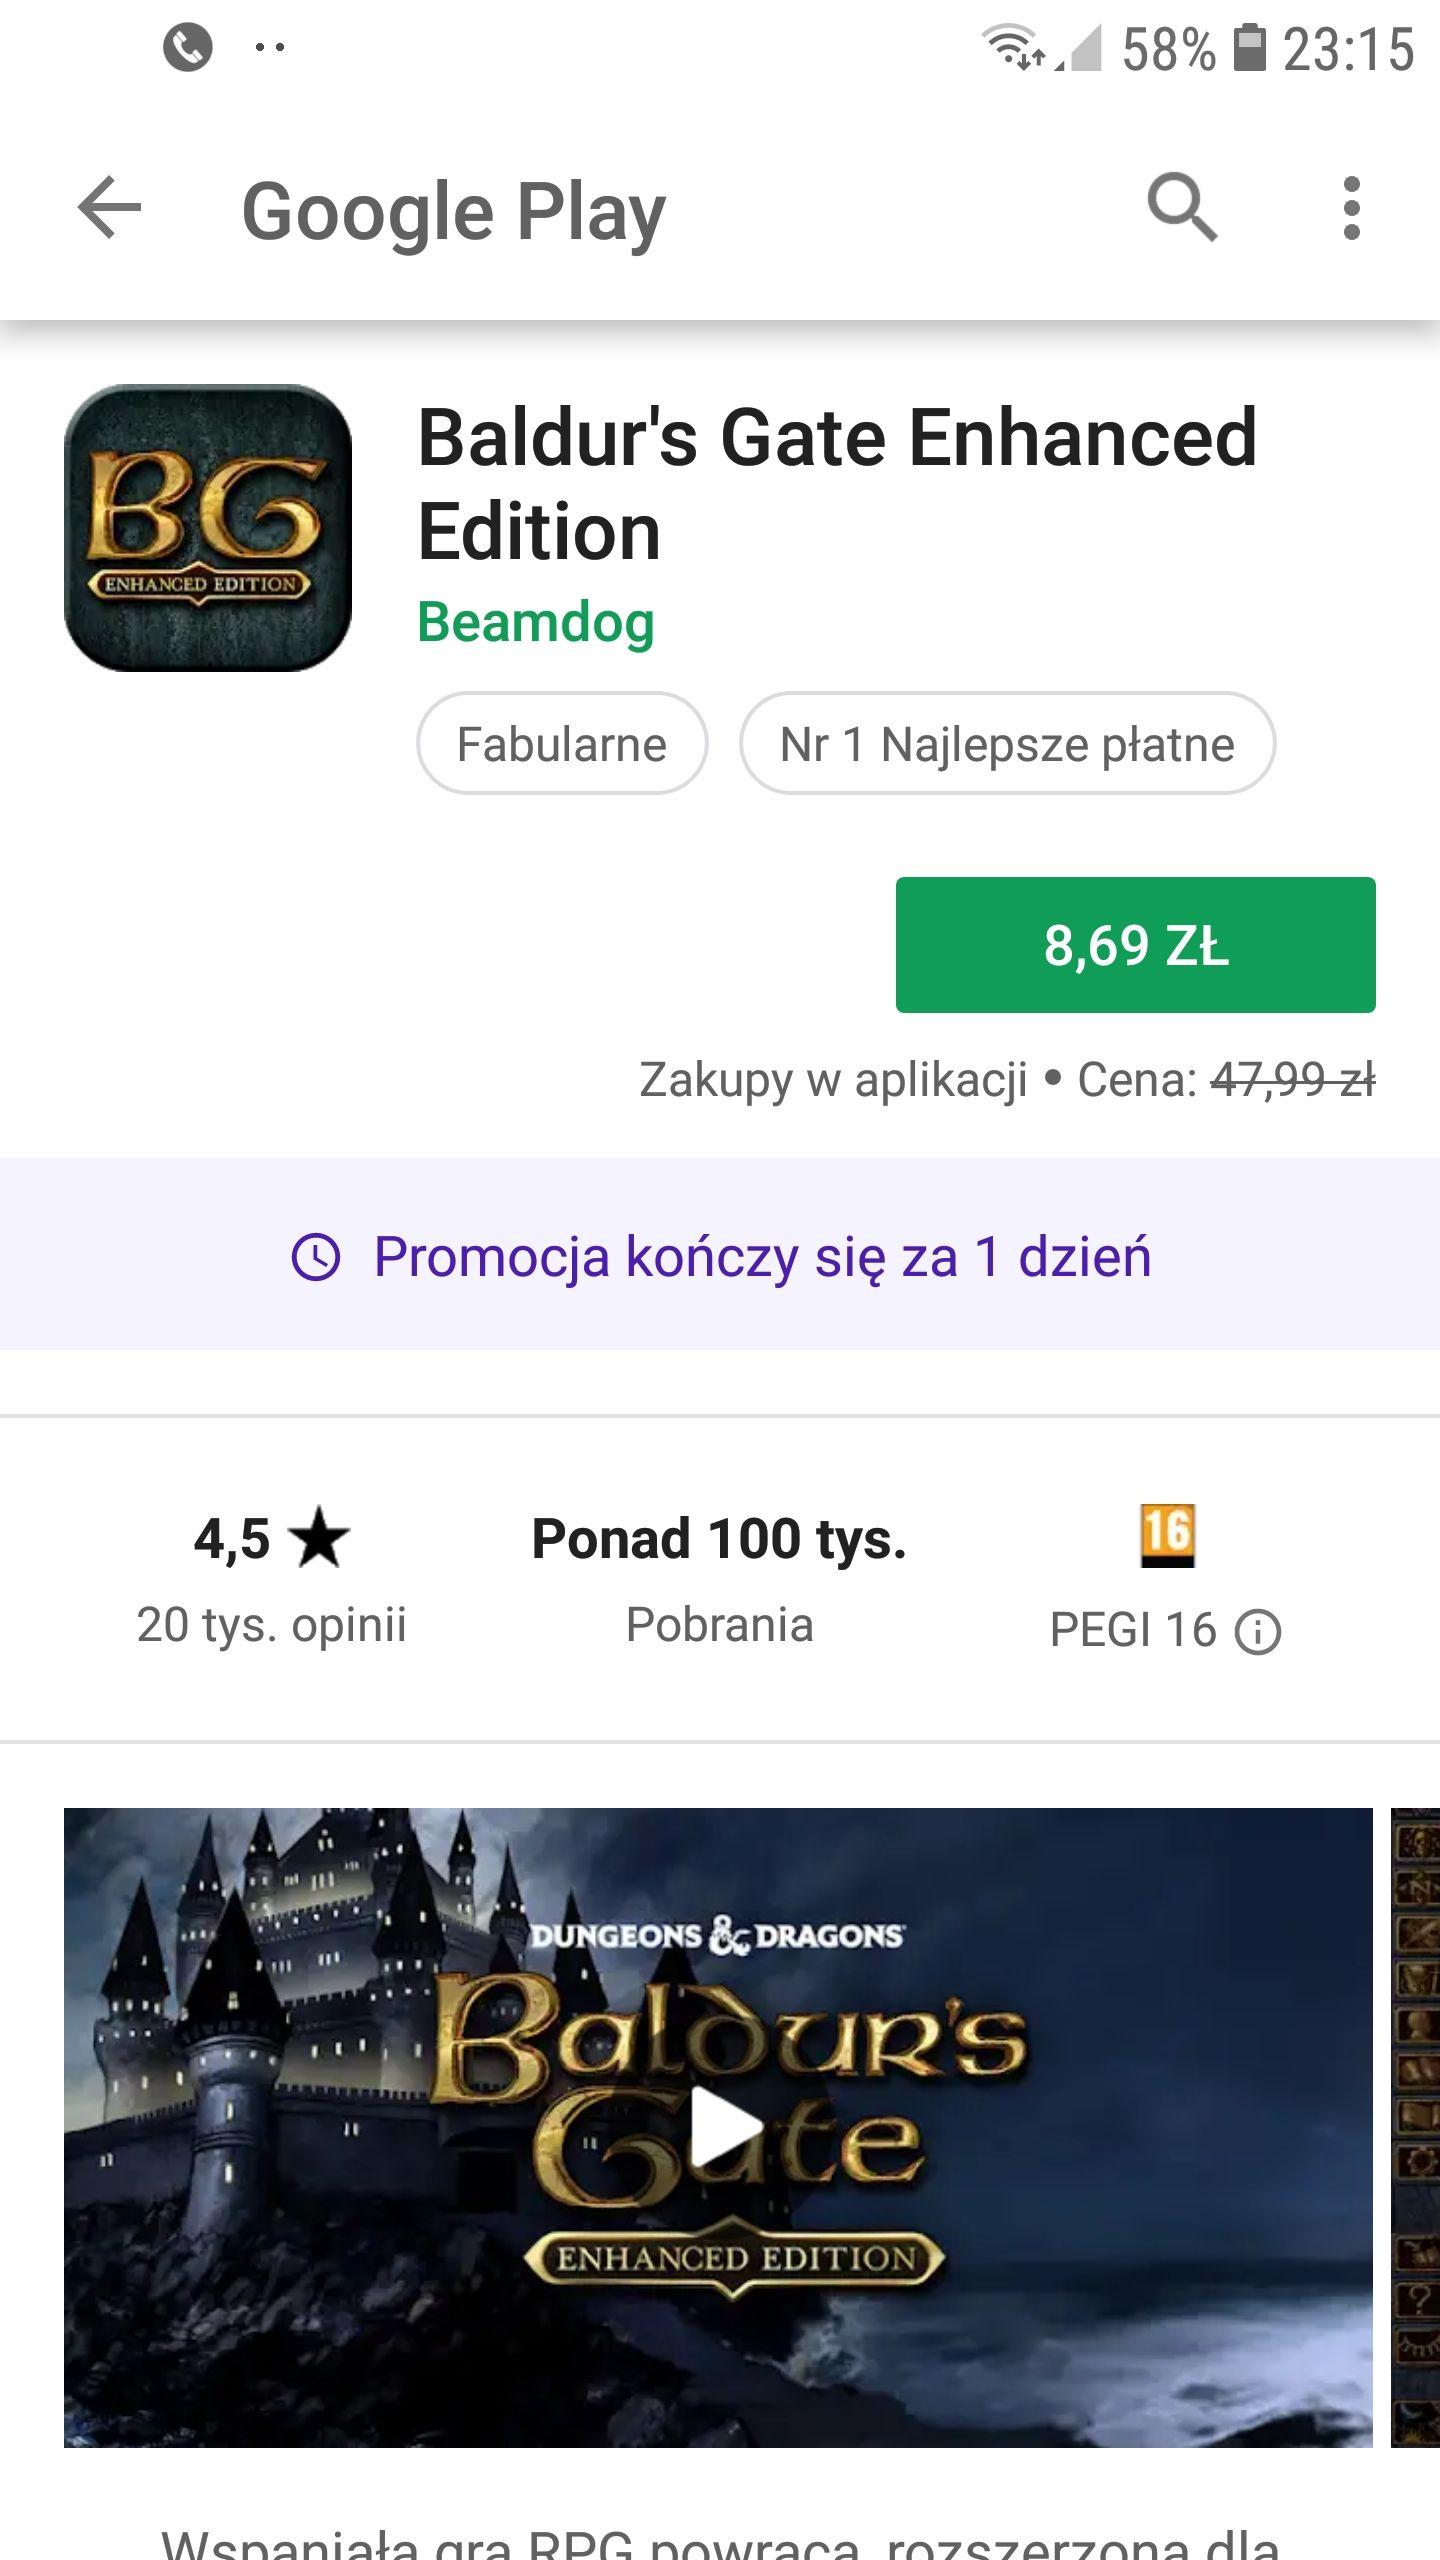 Baldur's Gate Enhanced Edition w wersji na Androida